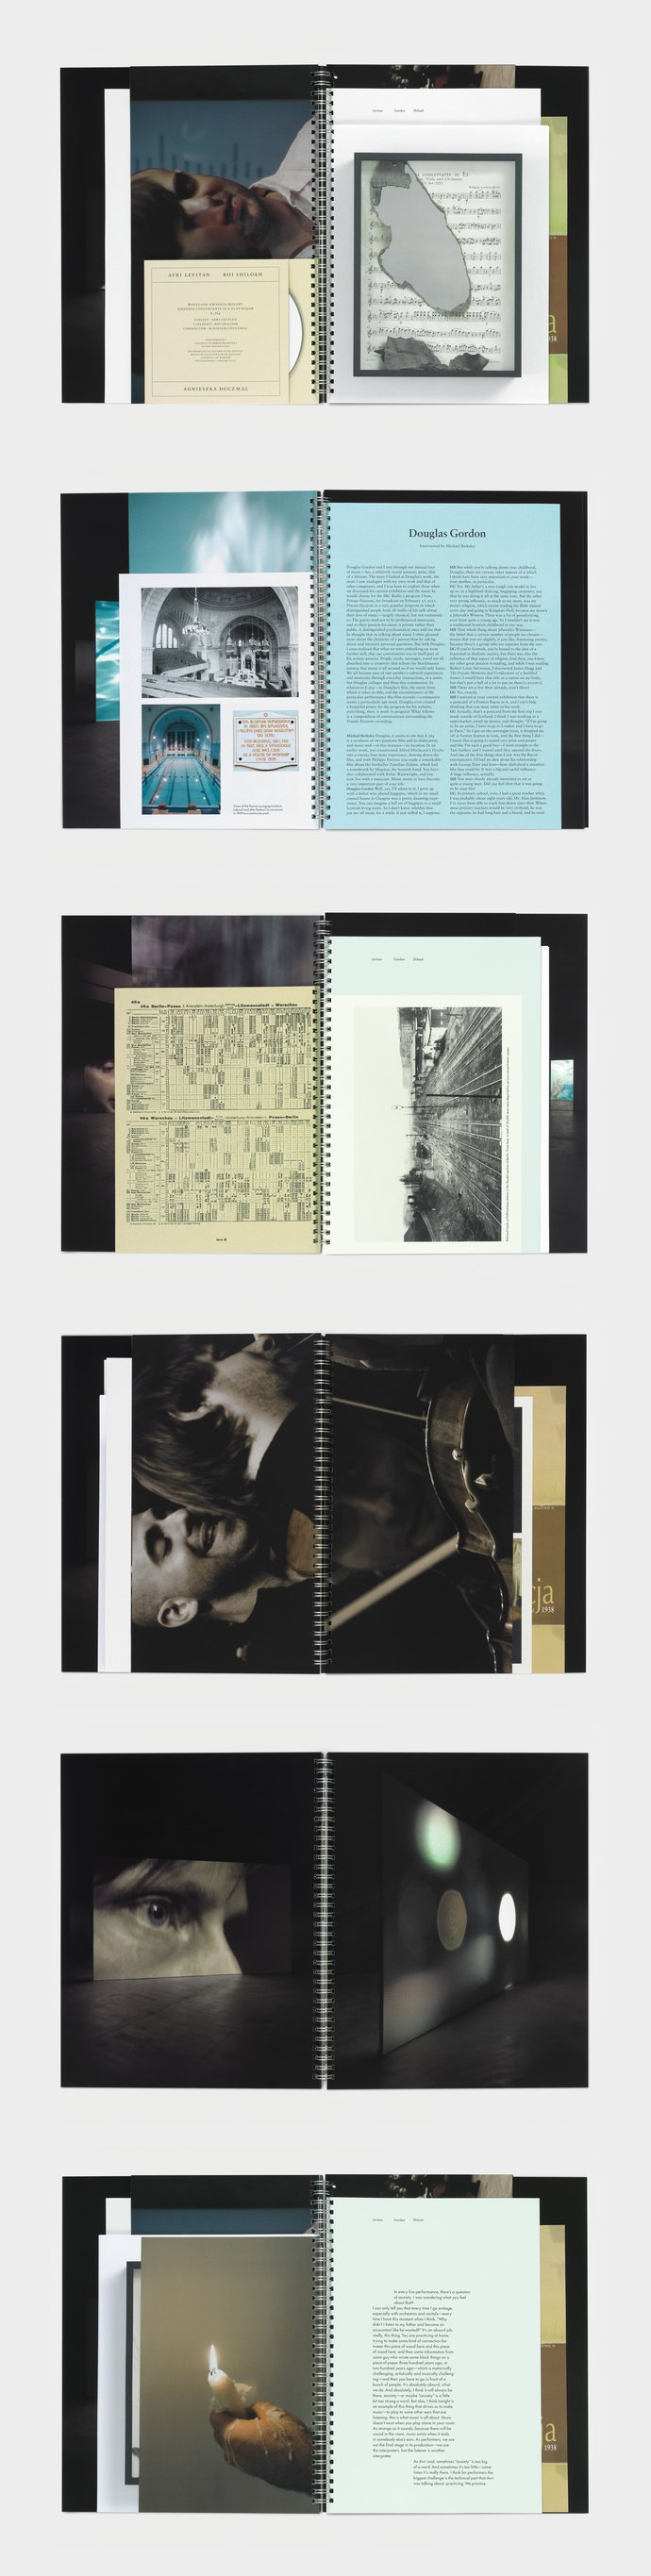 Gagosian – Douglas Gordon: k. 364, 2012 (Publication), image 4